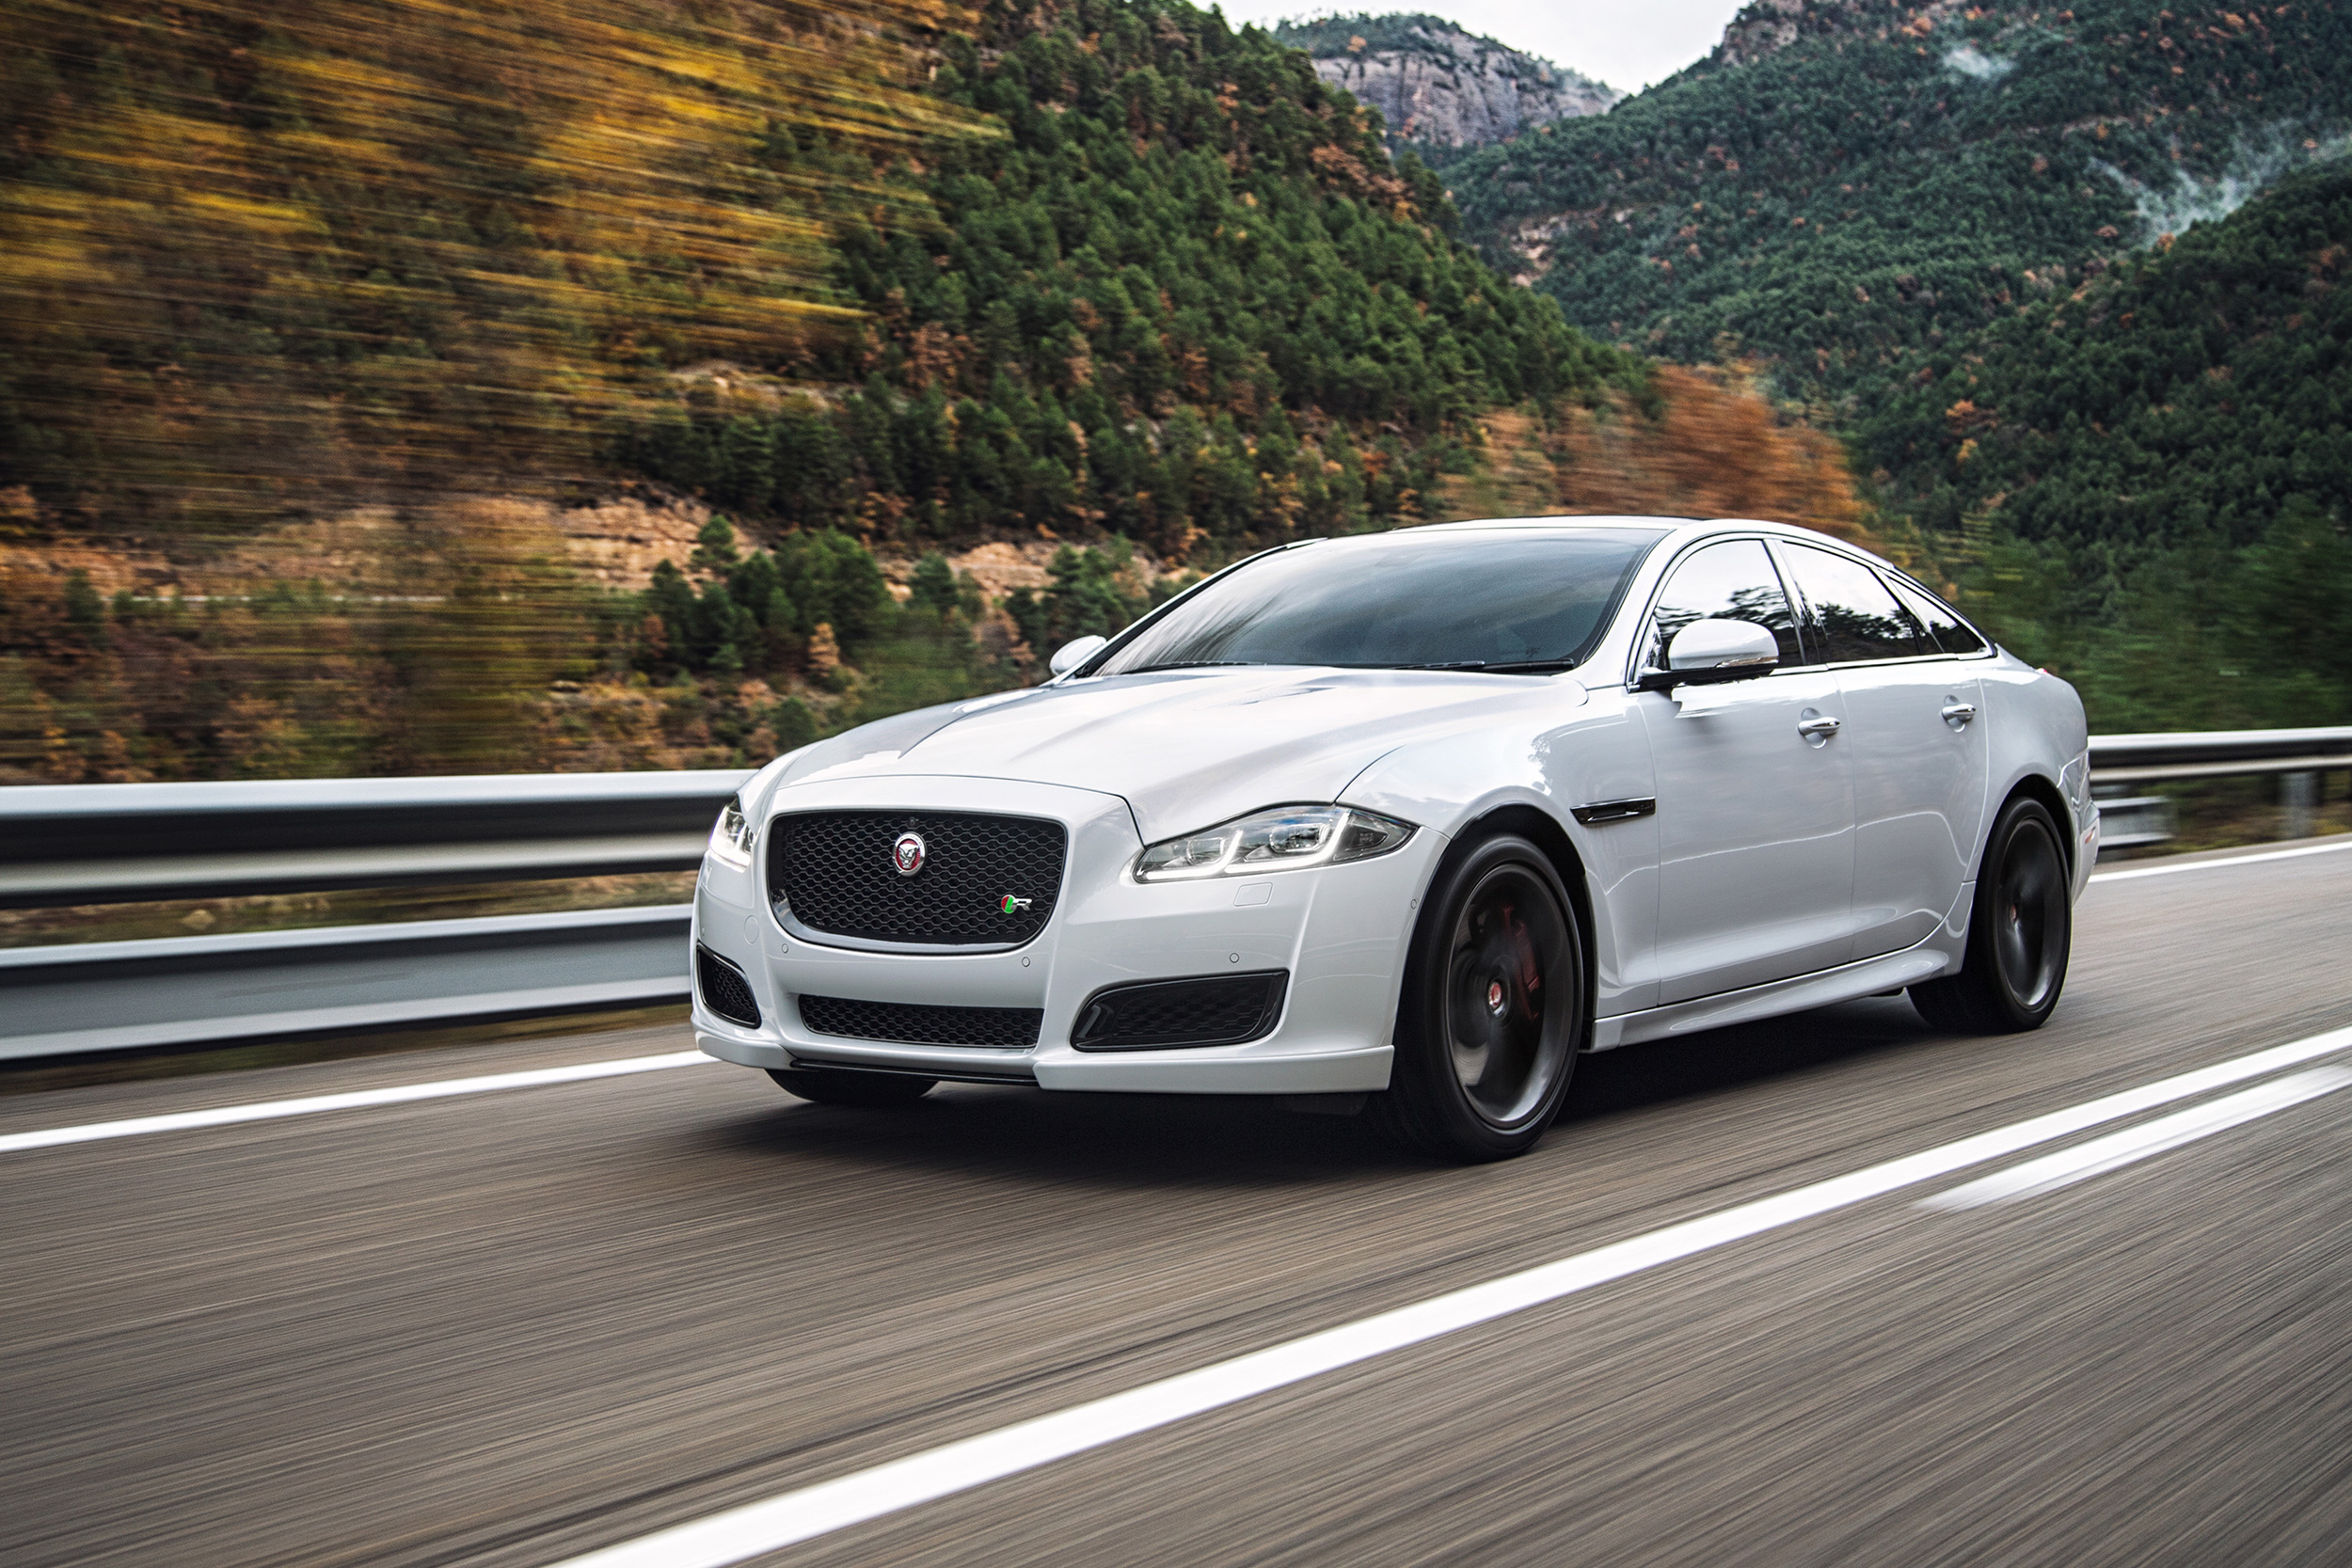 car list wikiwand d frontansicht jaguar m price bcnster supersport xj en juni s